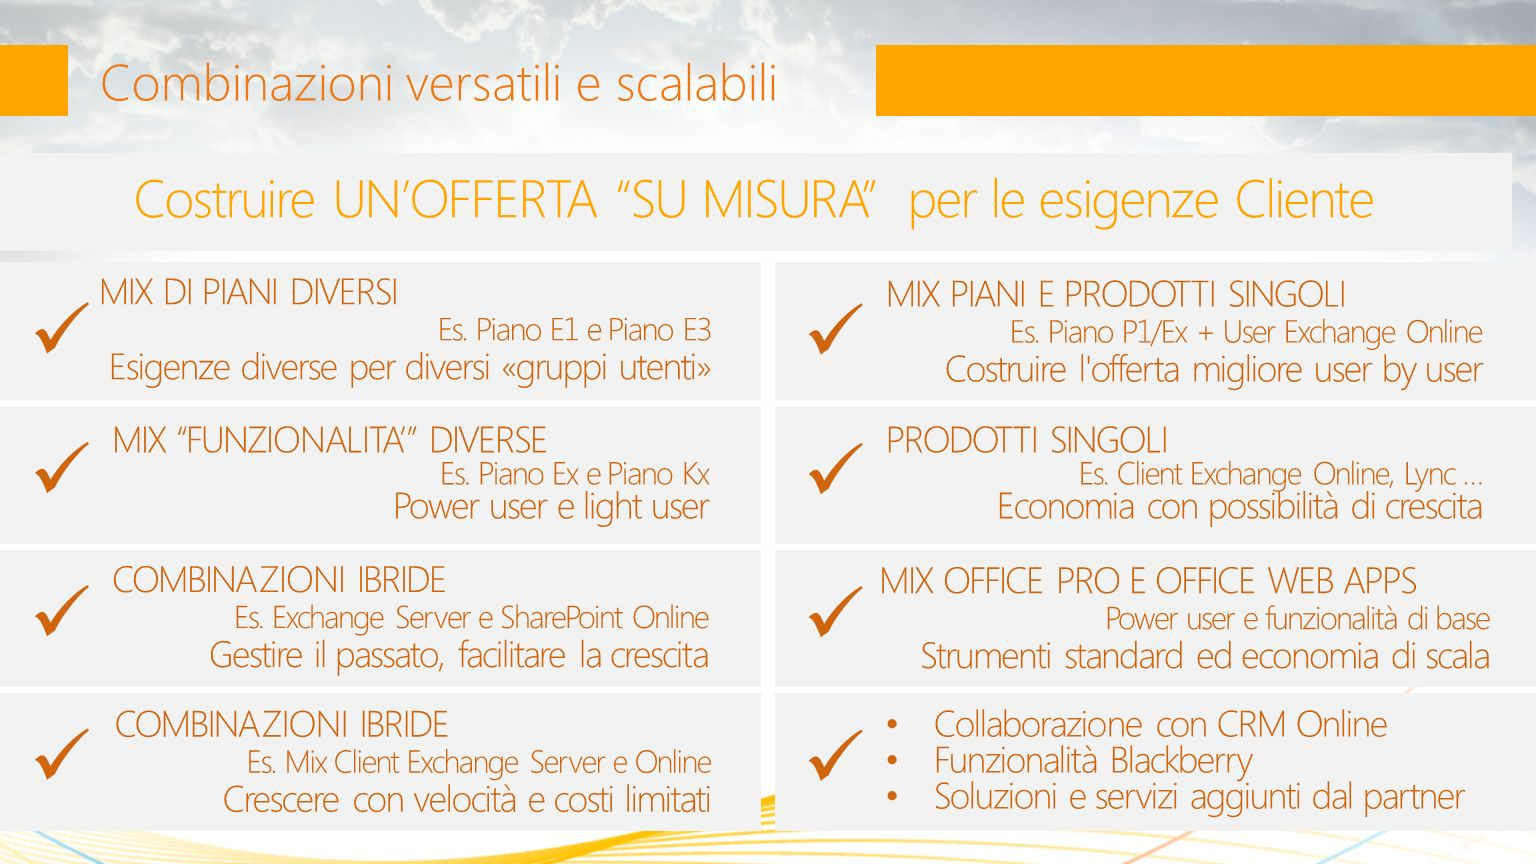 Combinazioni versatili e scalabili MIX DI PIANI DIVERSI Es.